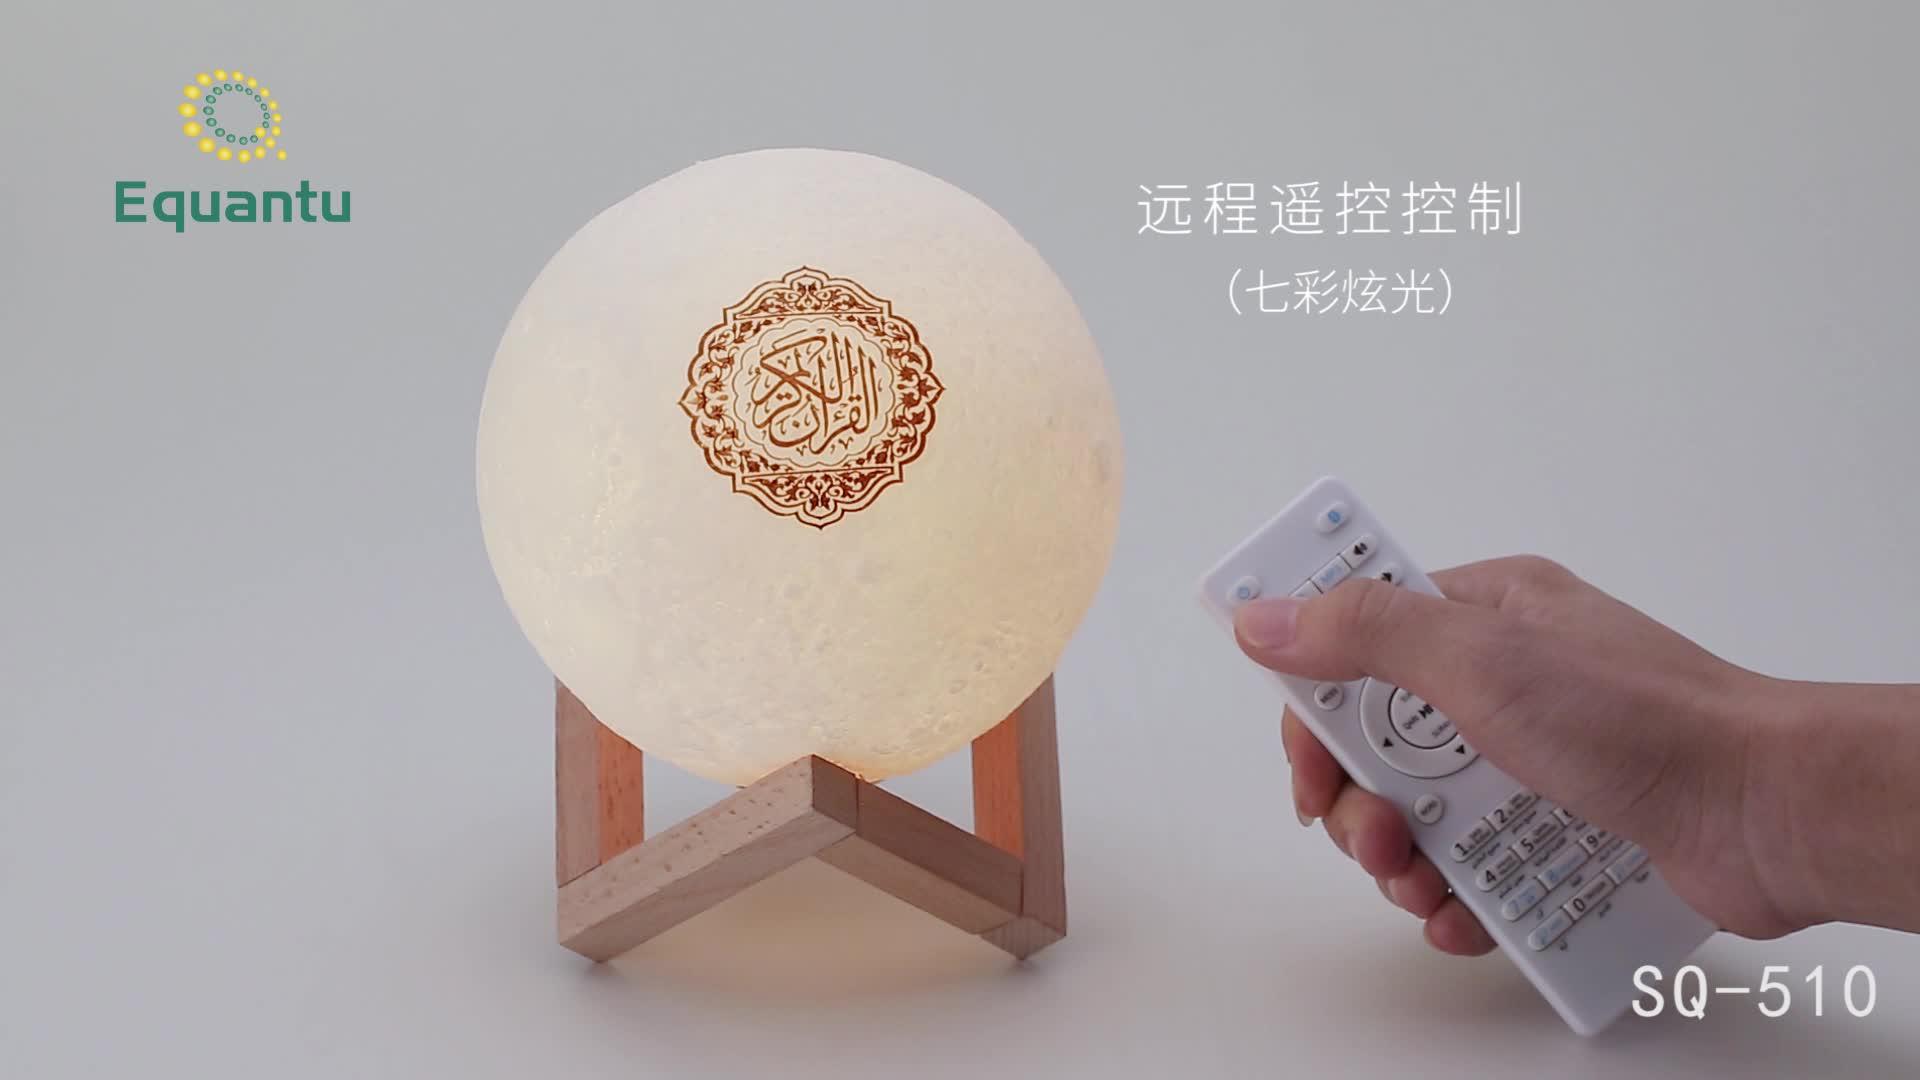 Gadget altoparlante lampada luna parola per parola quran islamico lampada di tocco quran altoparlante